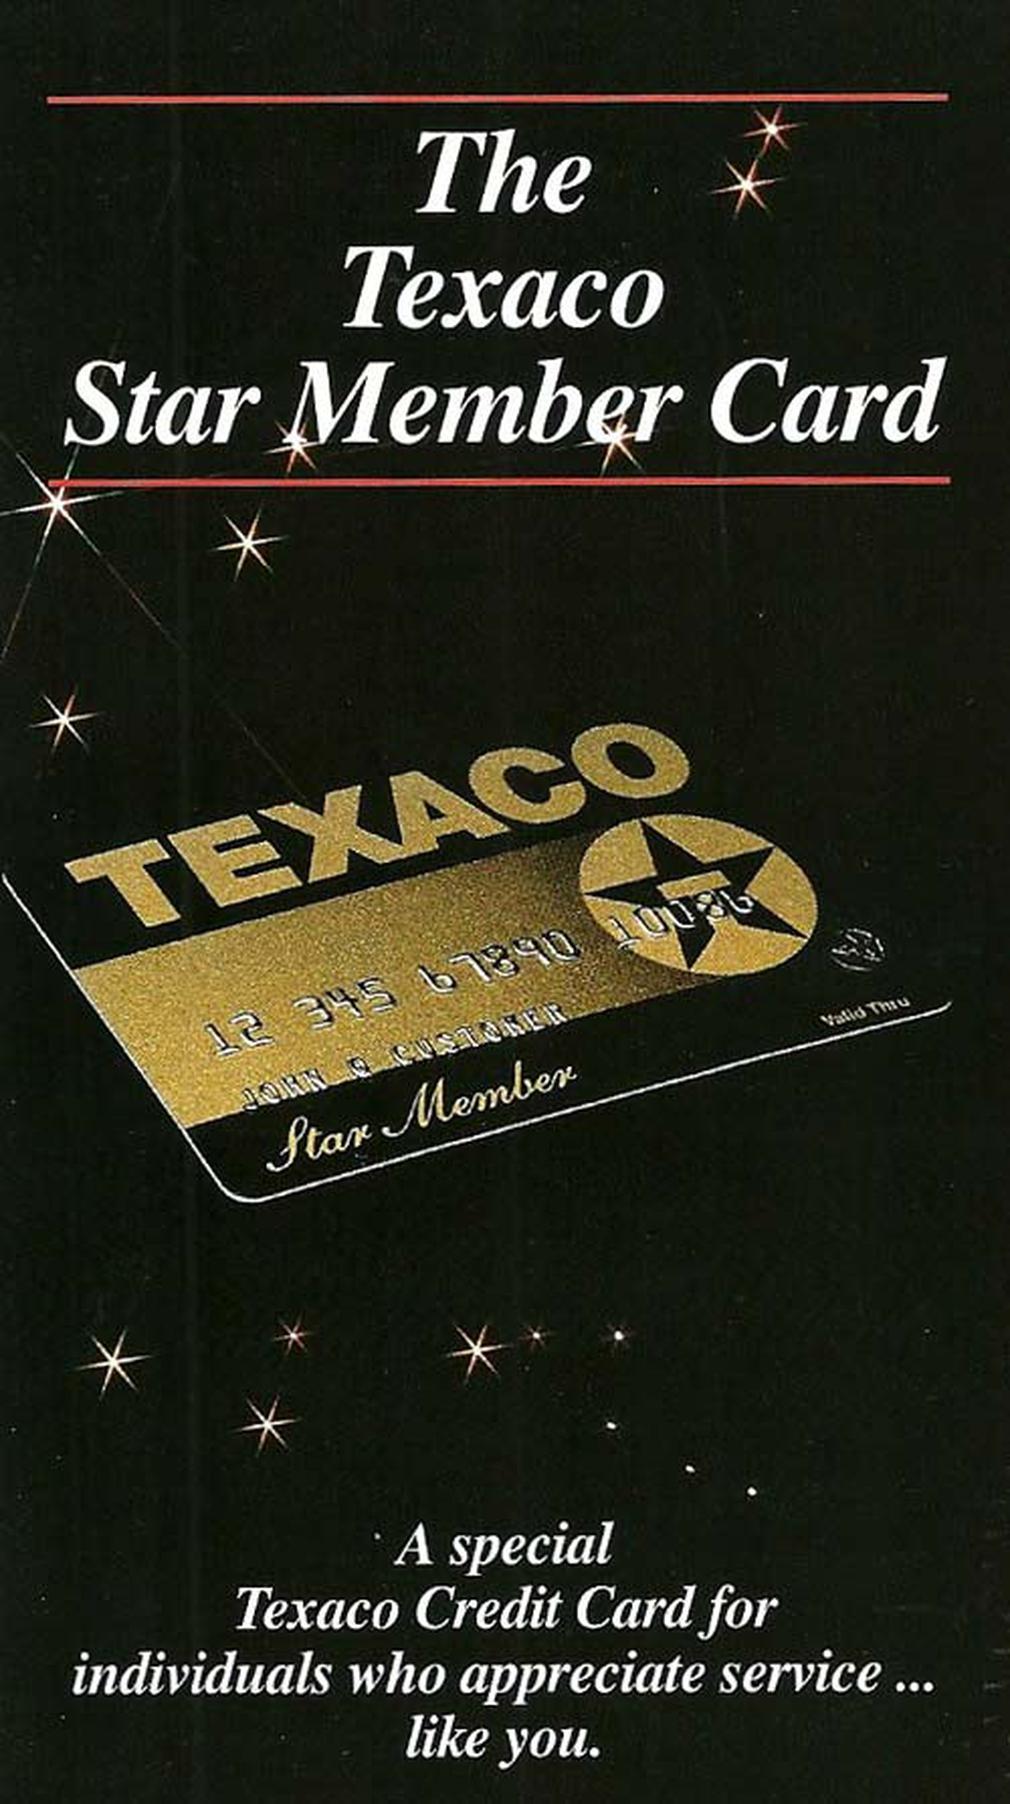 Texaco vintage credit card ad